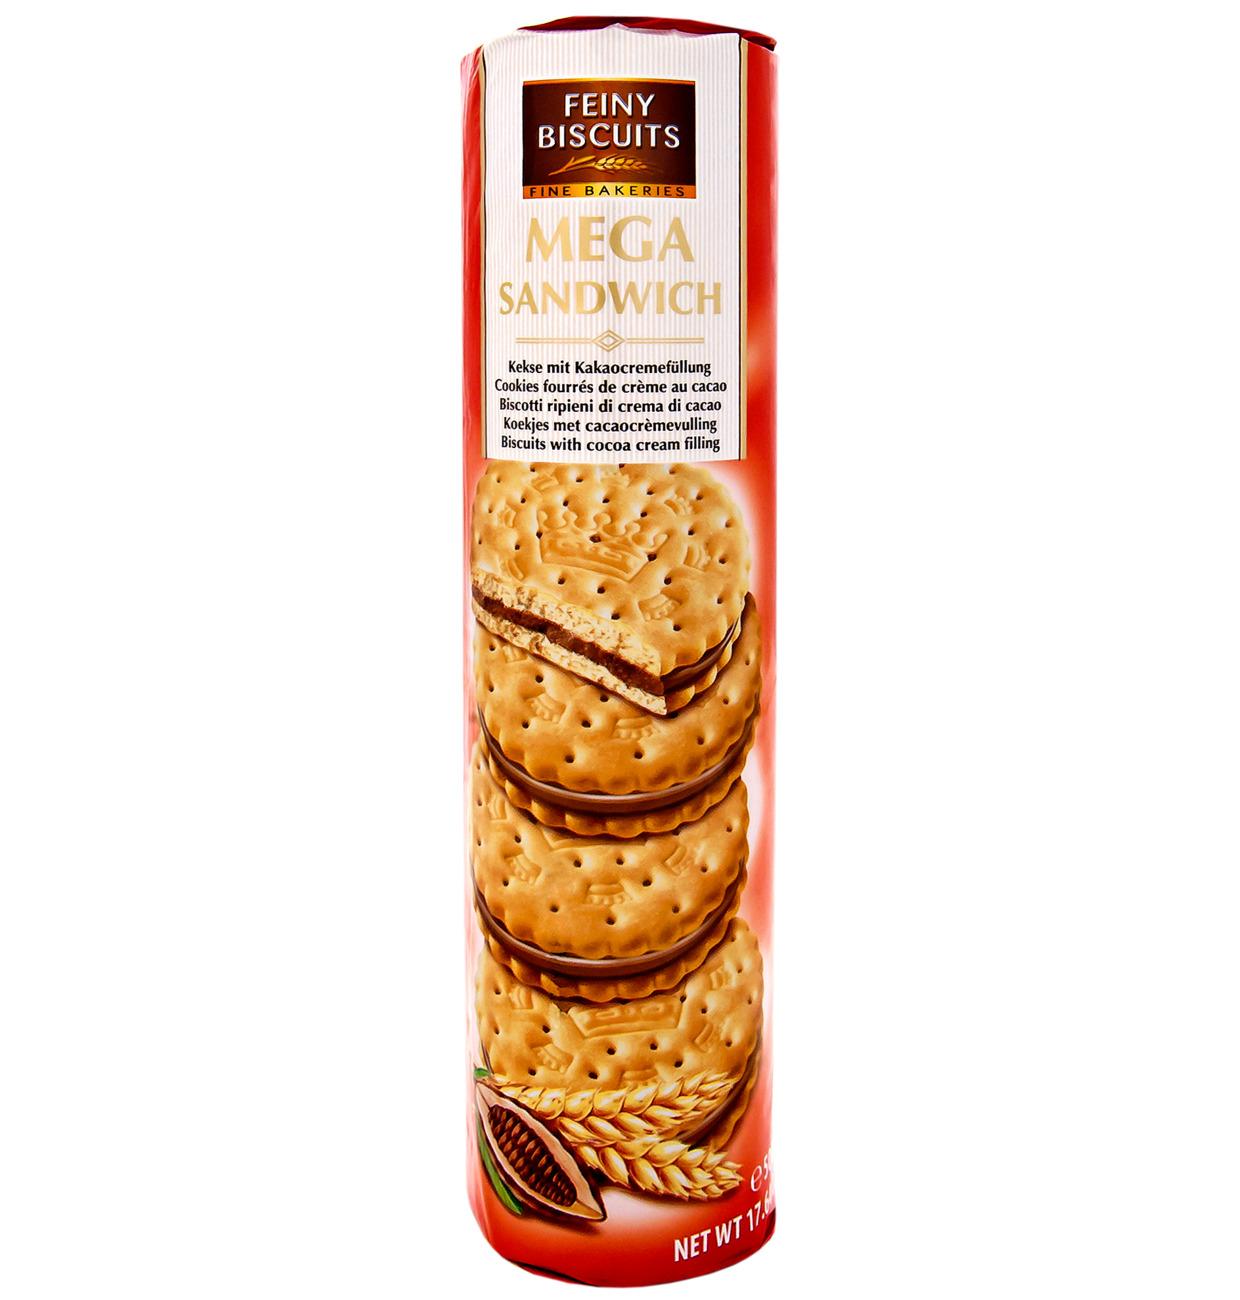 Mega Sandwich Kekse mit Kakaocremefüllung 500g